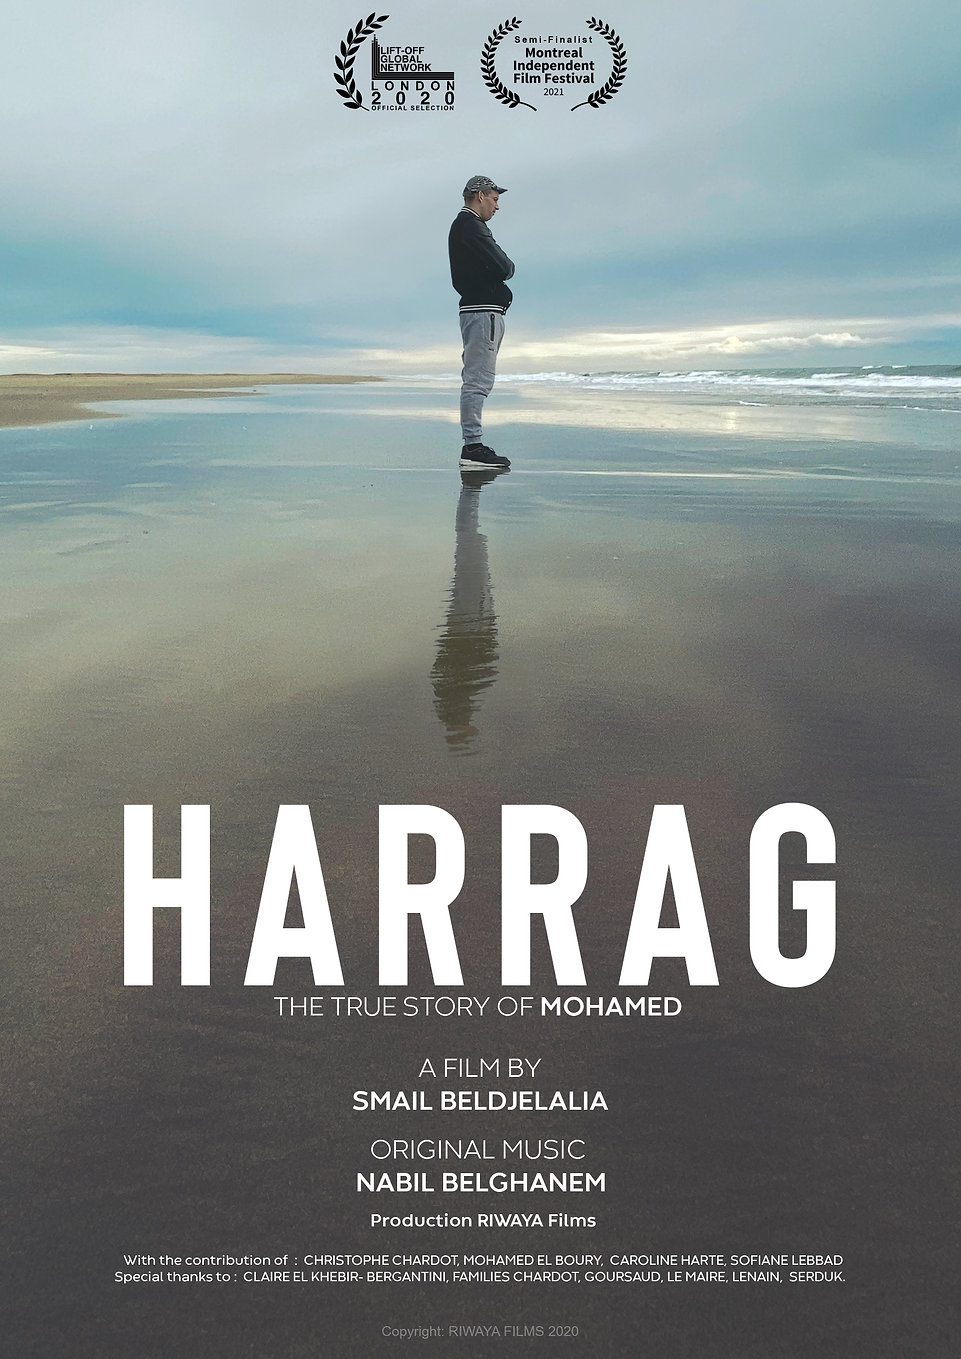 HARRAG + Laurel.jpg